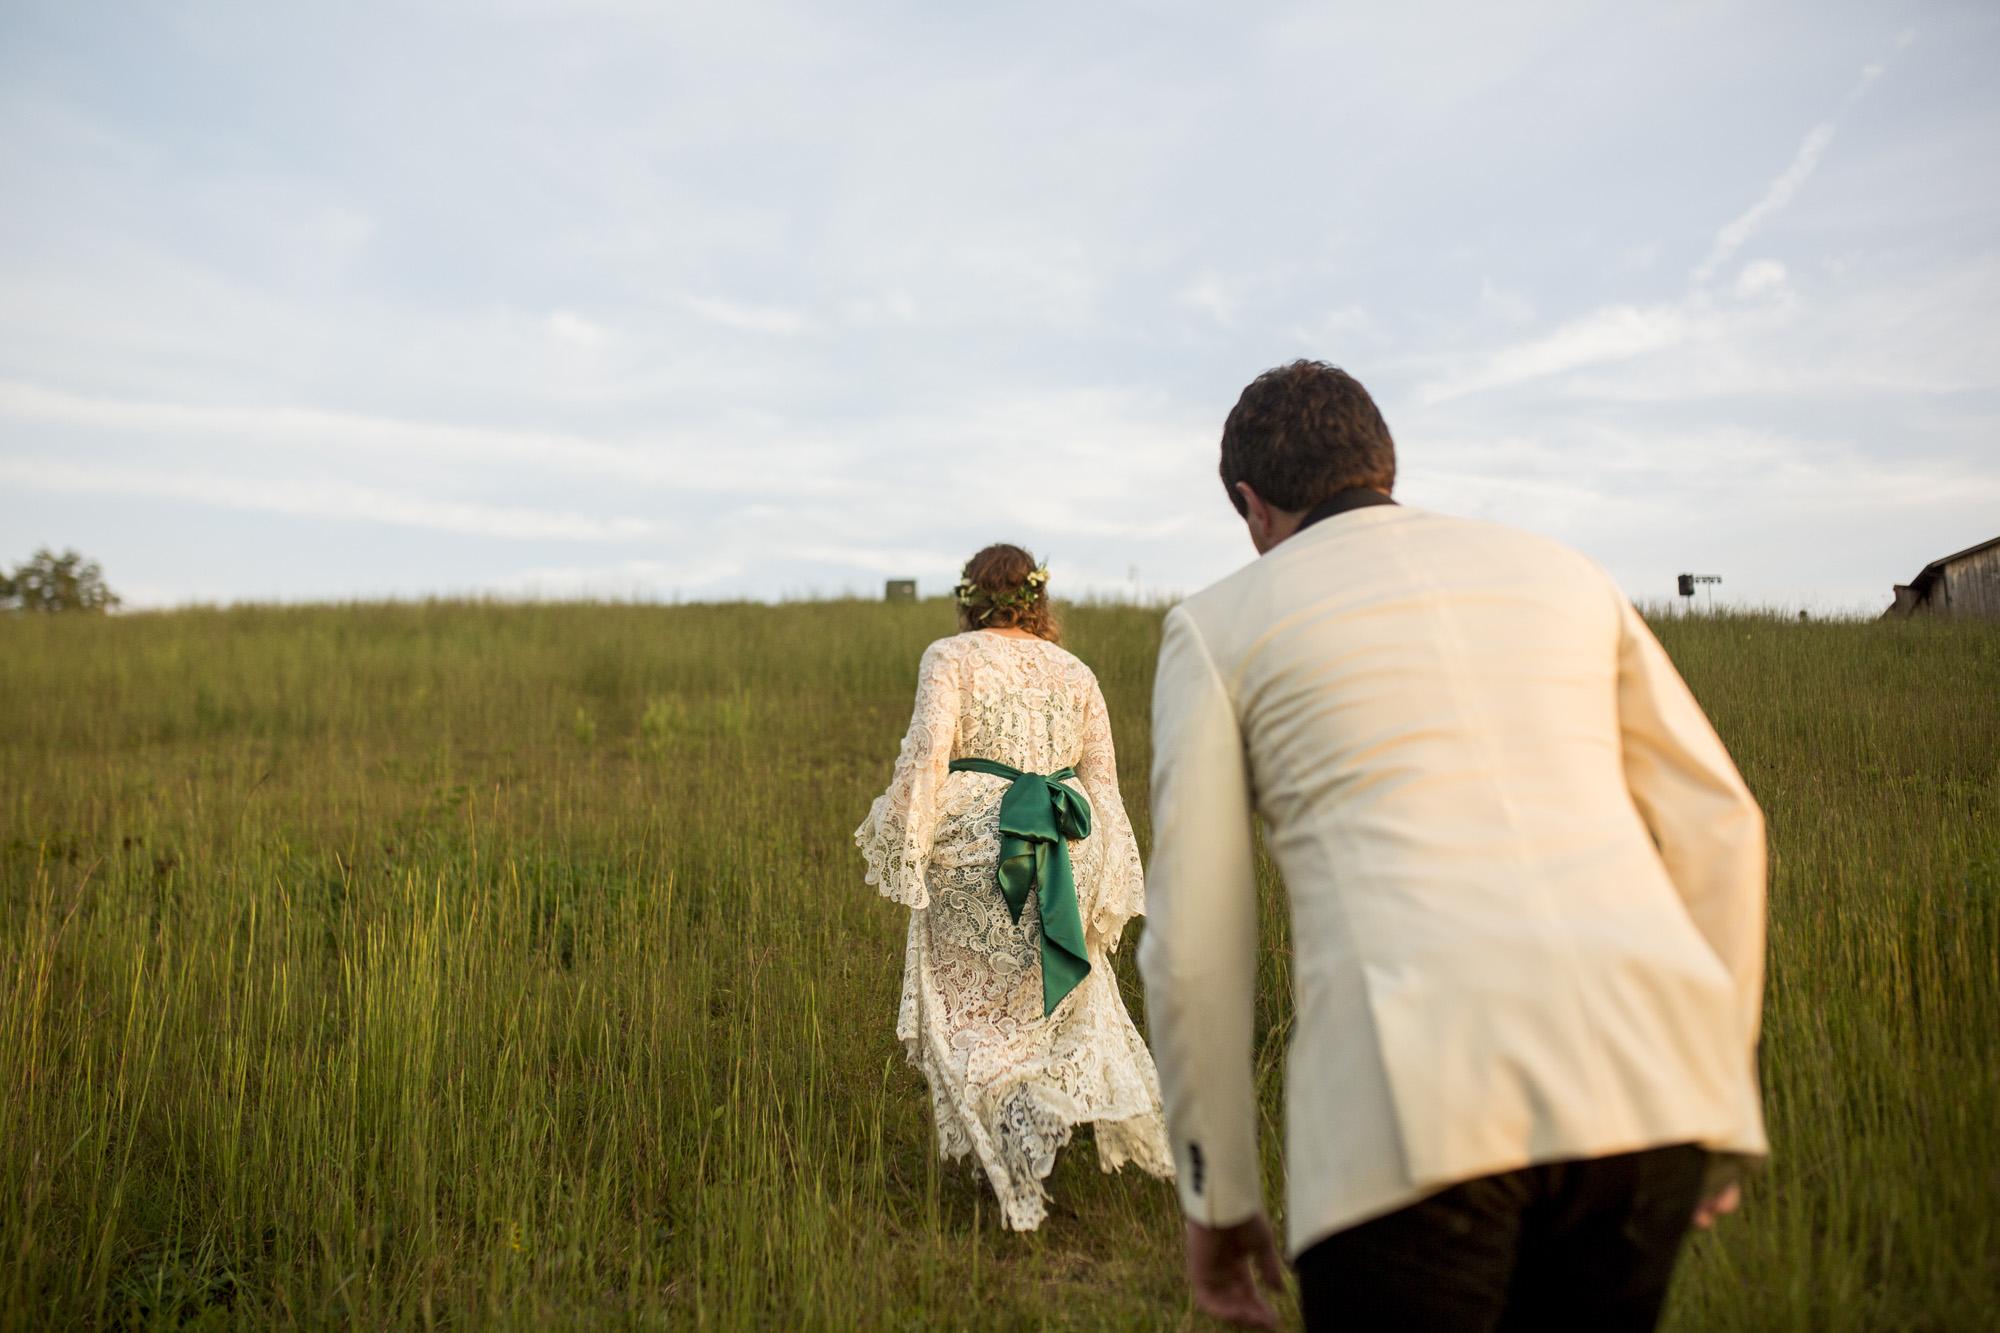 Seriously_Sabrina_Photography_Red_River_Gorge_Kentucky_Wedding_ShawnDana168.jpg